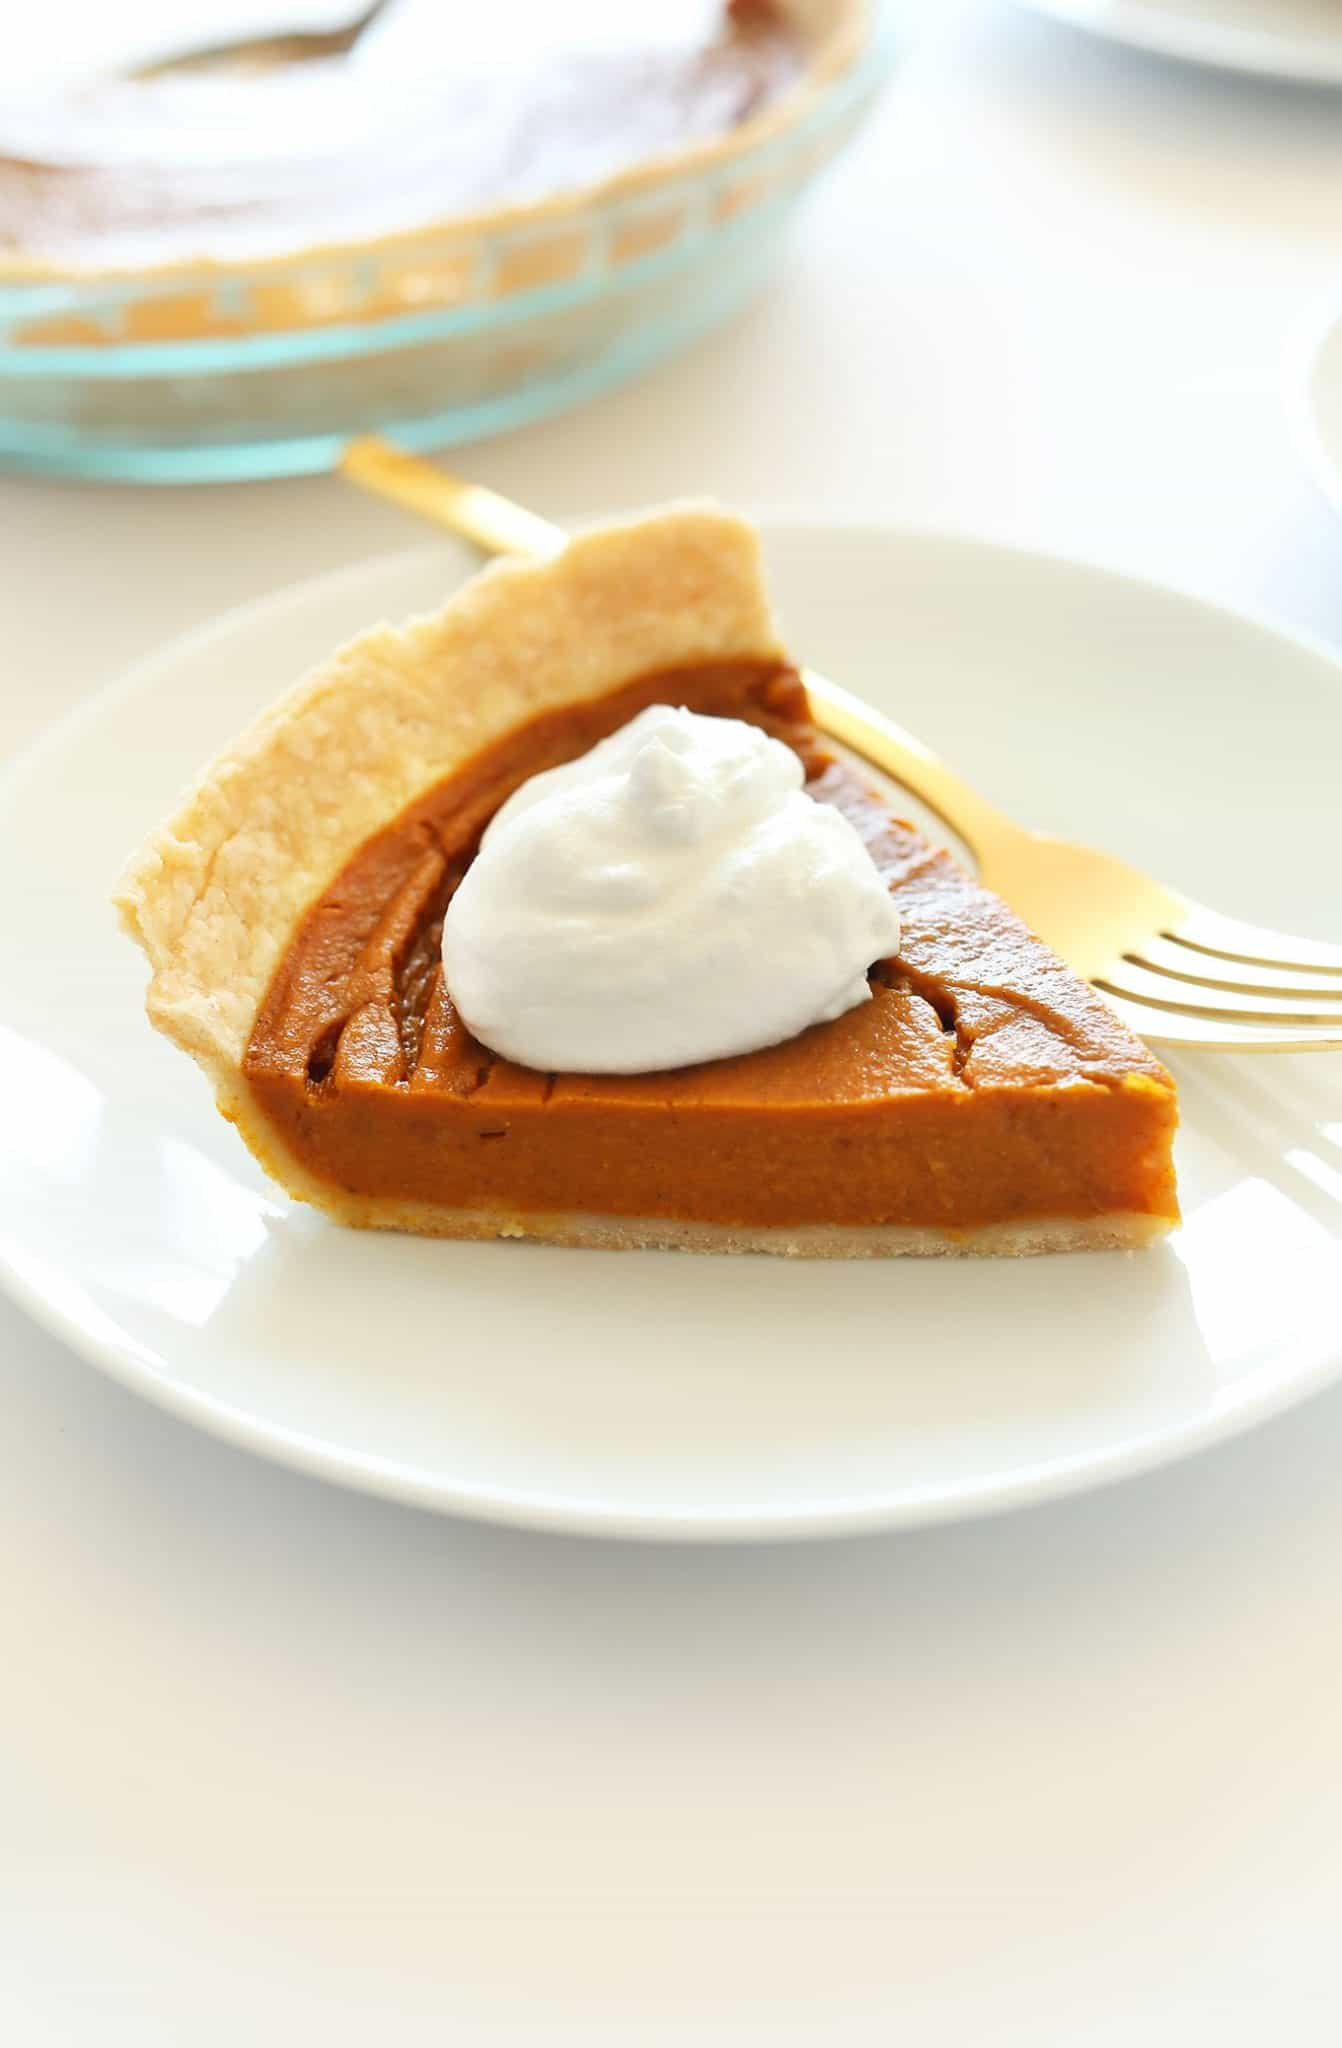 THE-BEST-Vegan-Gluten-Free-Pumpkin-Pie-10-ingredients-simple-methods-SO-delicious